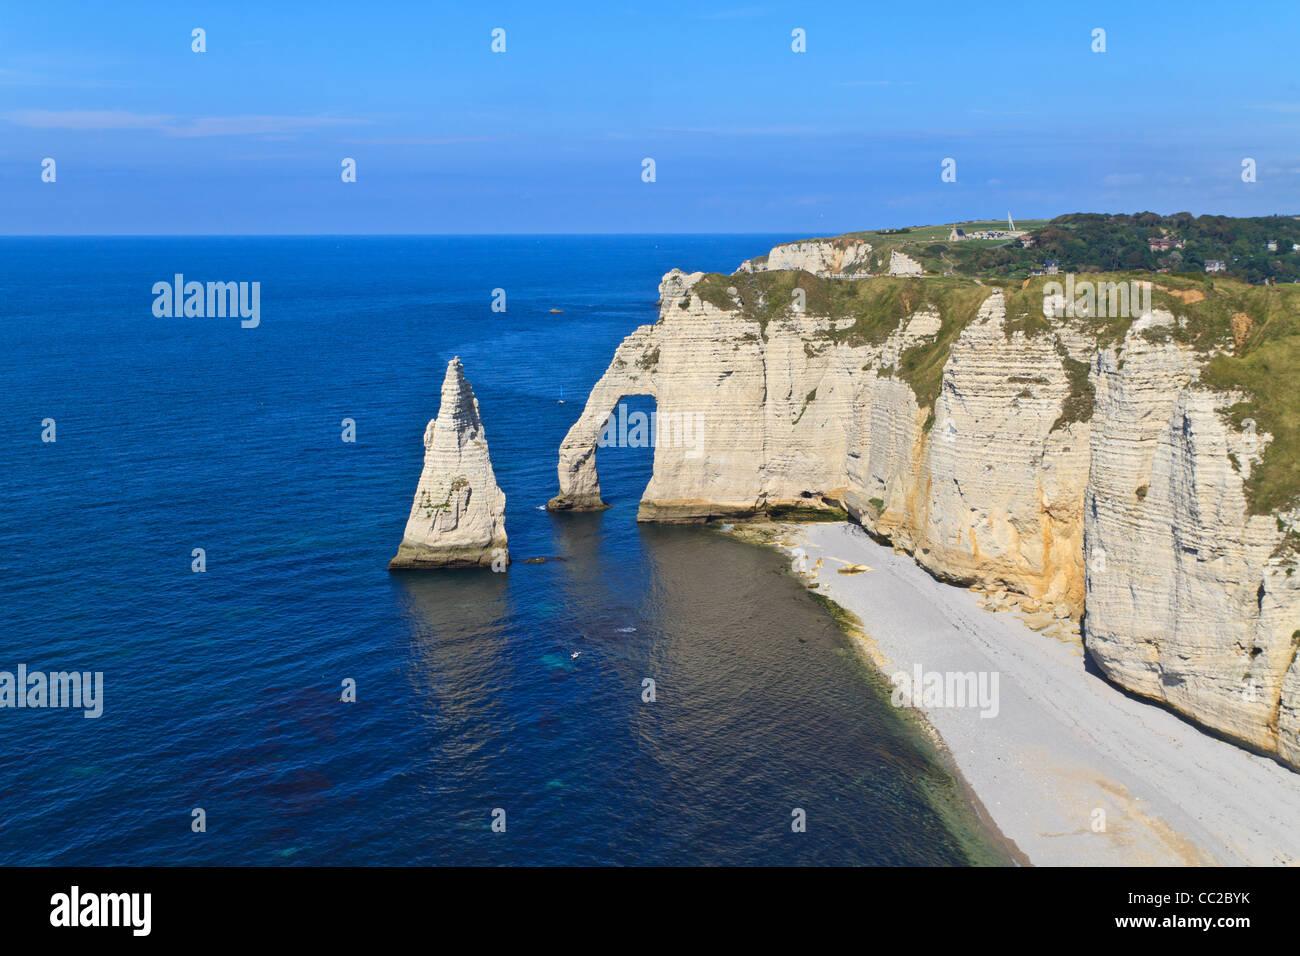 Cliffs of Etretat, Normandy, France - Stock Image